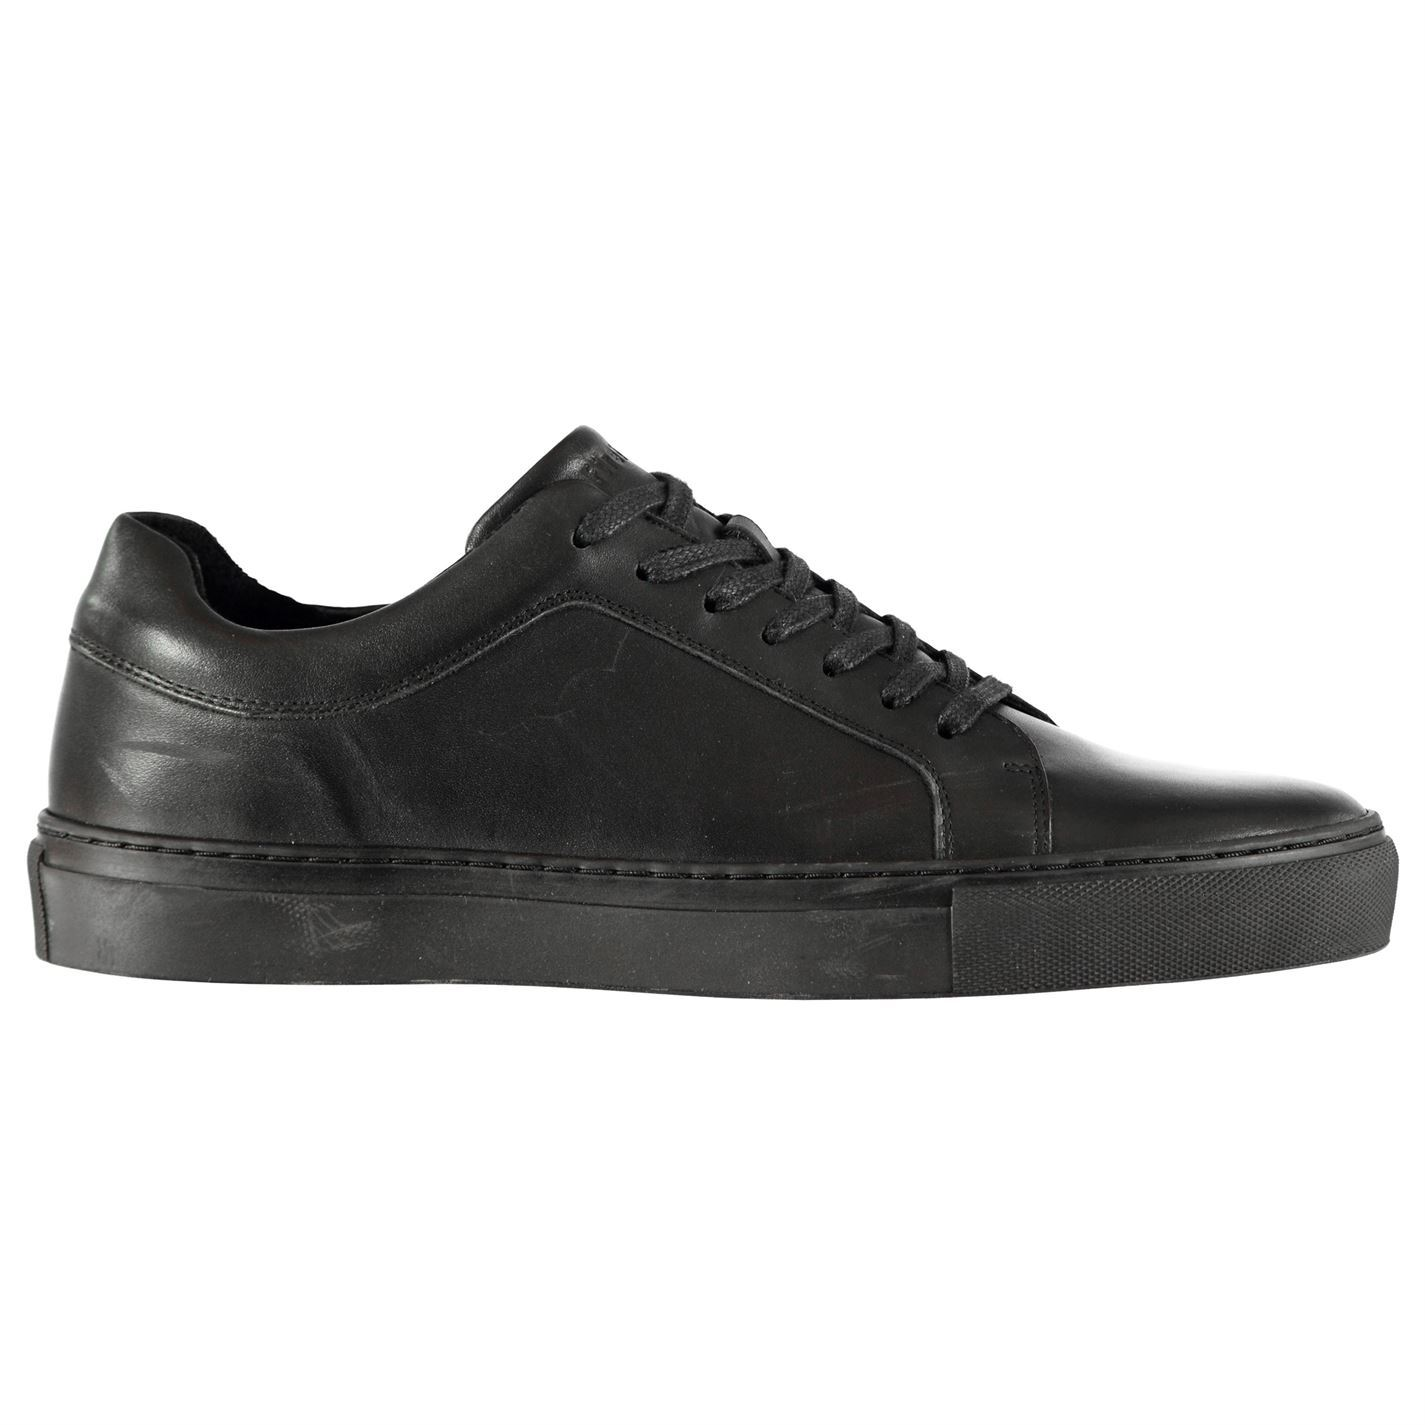 Firetrap Gents Altona Sneakers  Uomo Gents Firetrap Niedrig Laces Fastened Comfortable Fit Tonal e0d28e